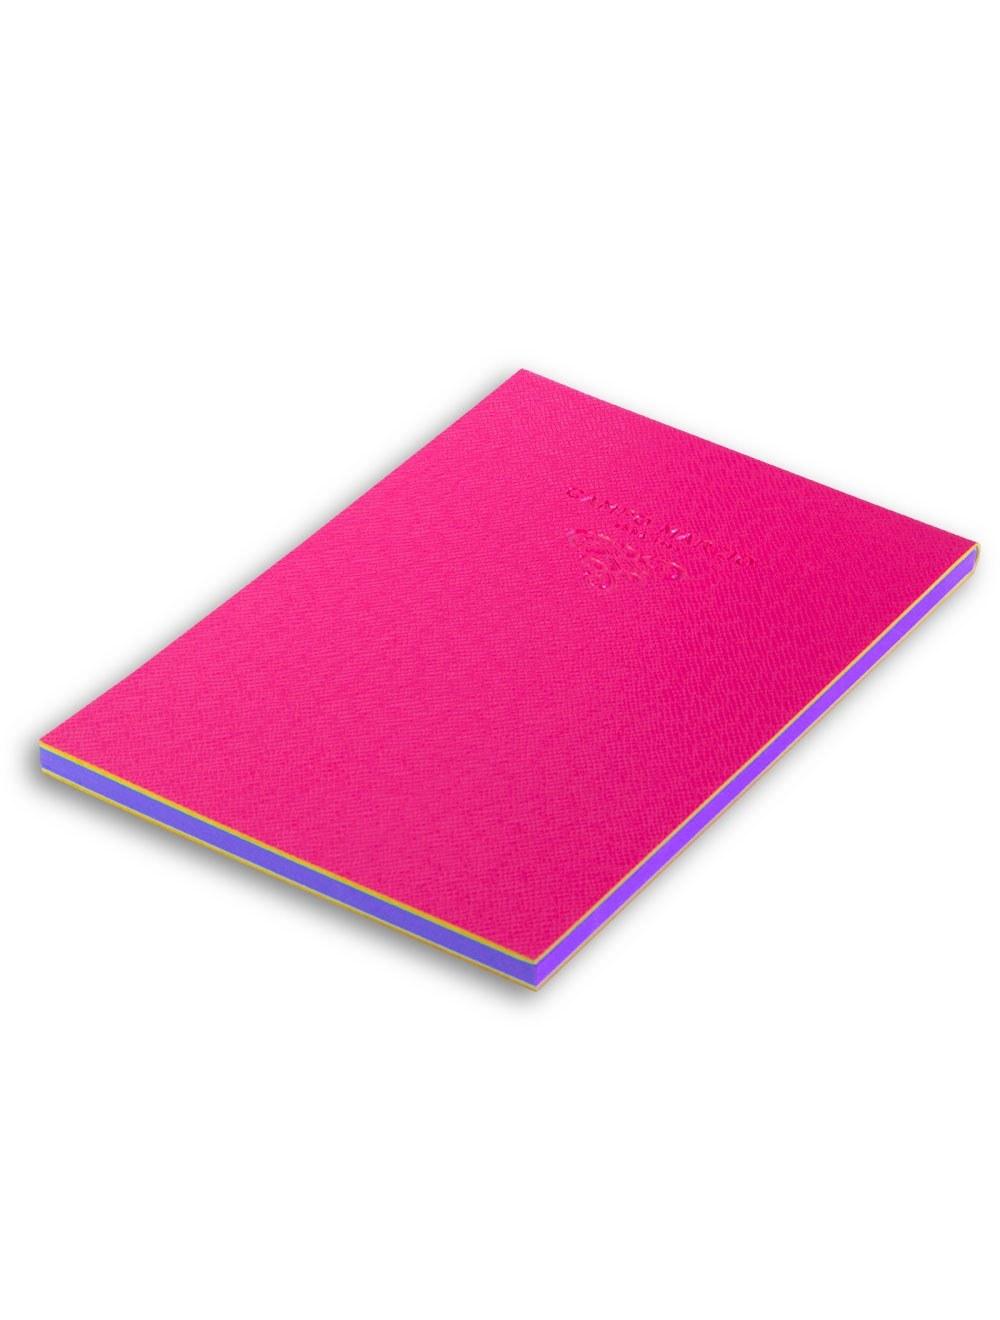 Notes 15 X 21 Cm Saffiano - Hot Pink